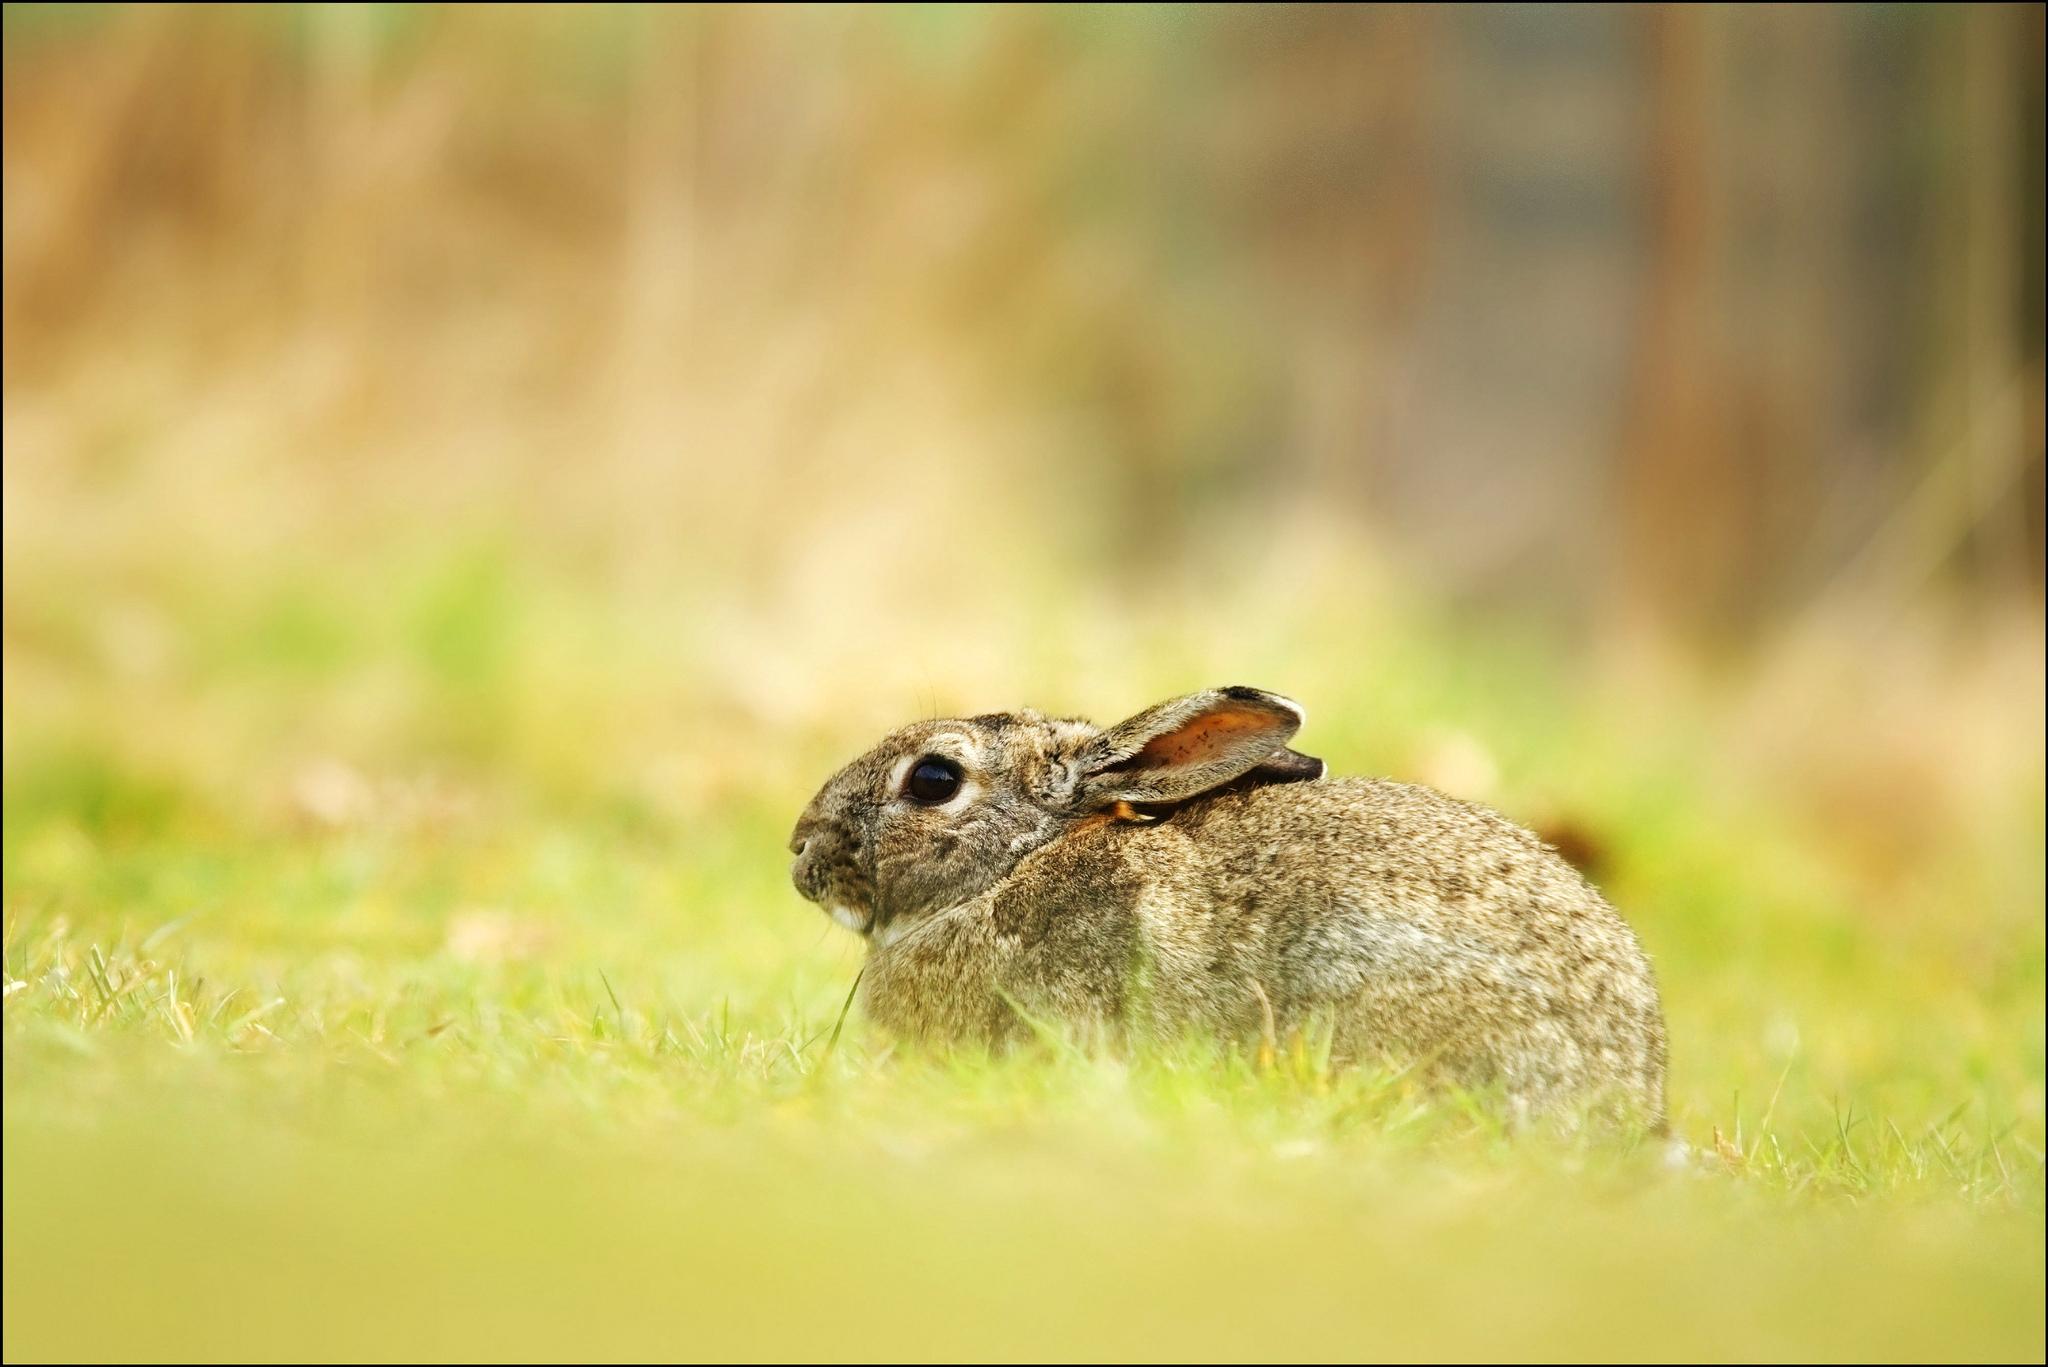 hare cute